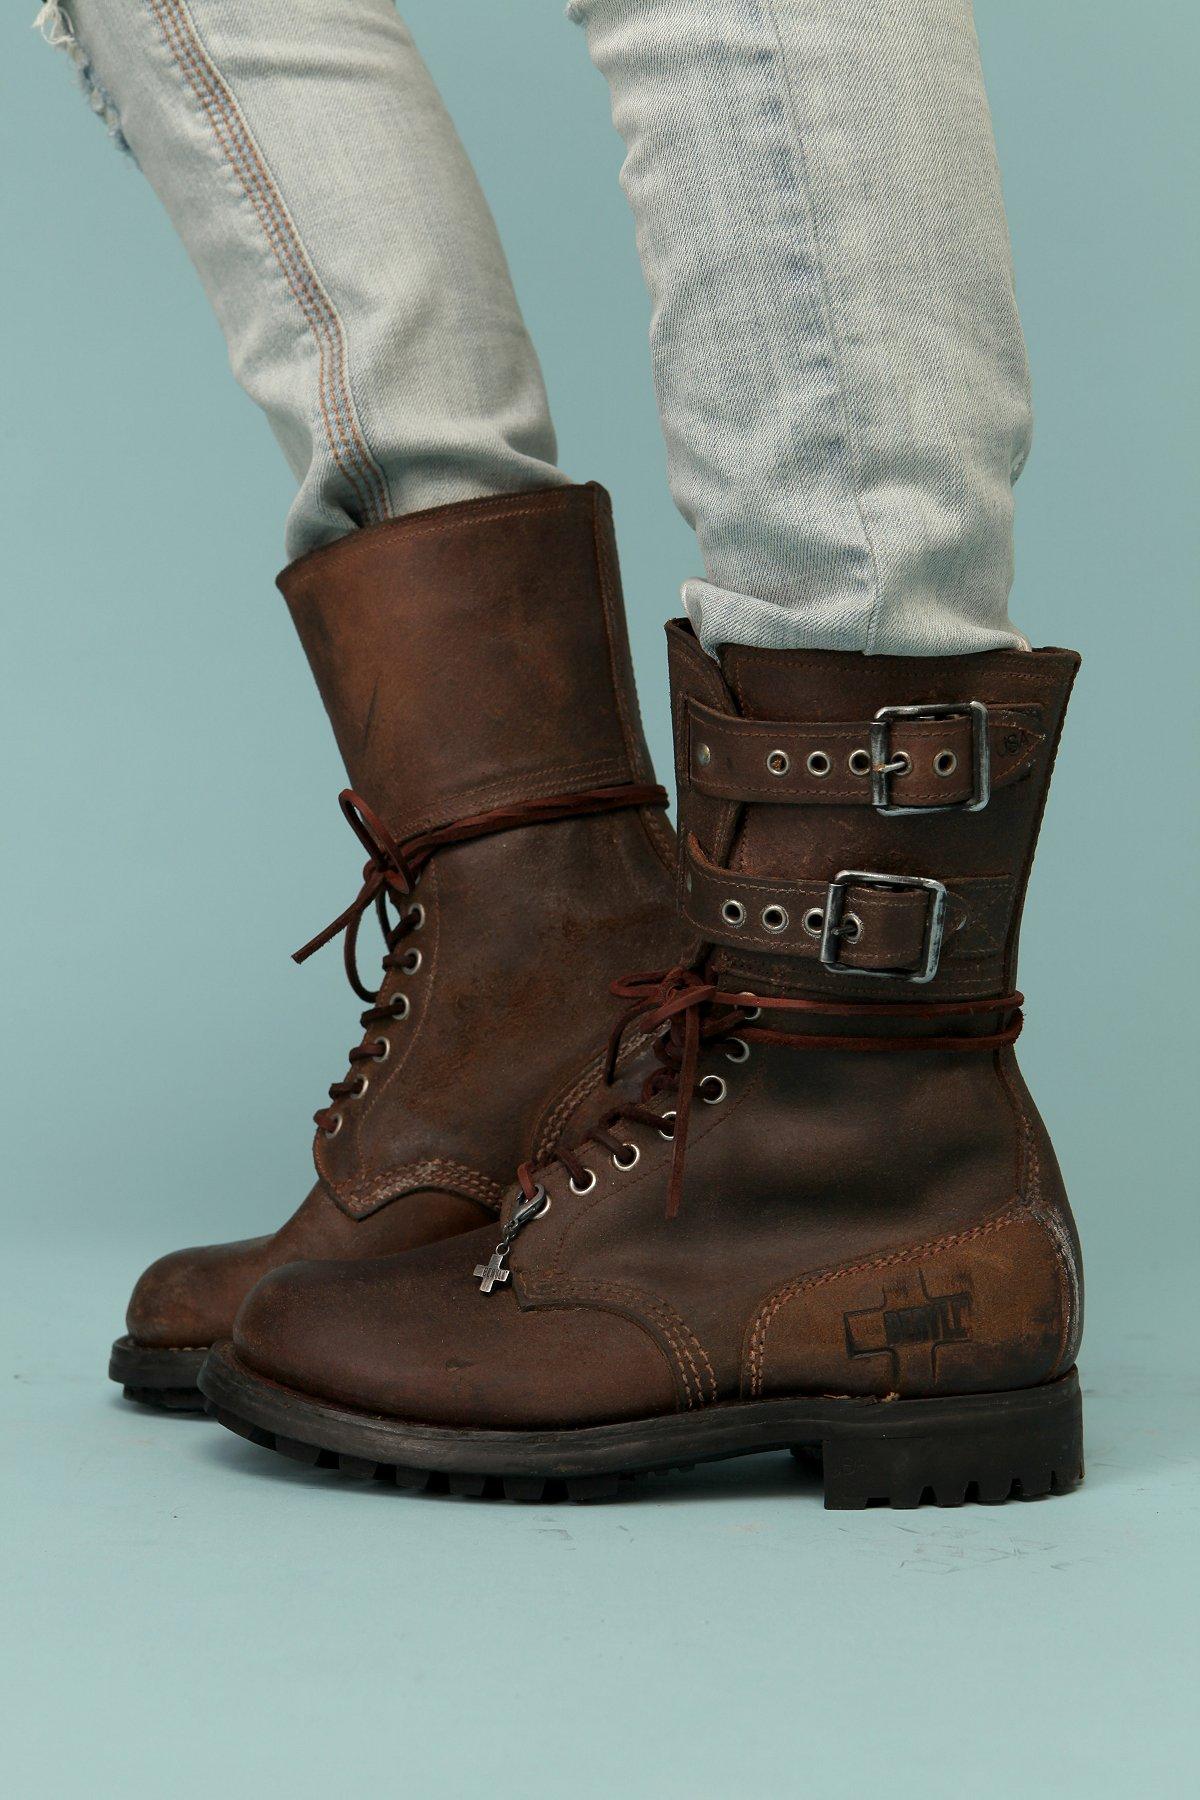 Vintage Artisan Asphalt Boot